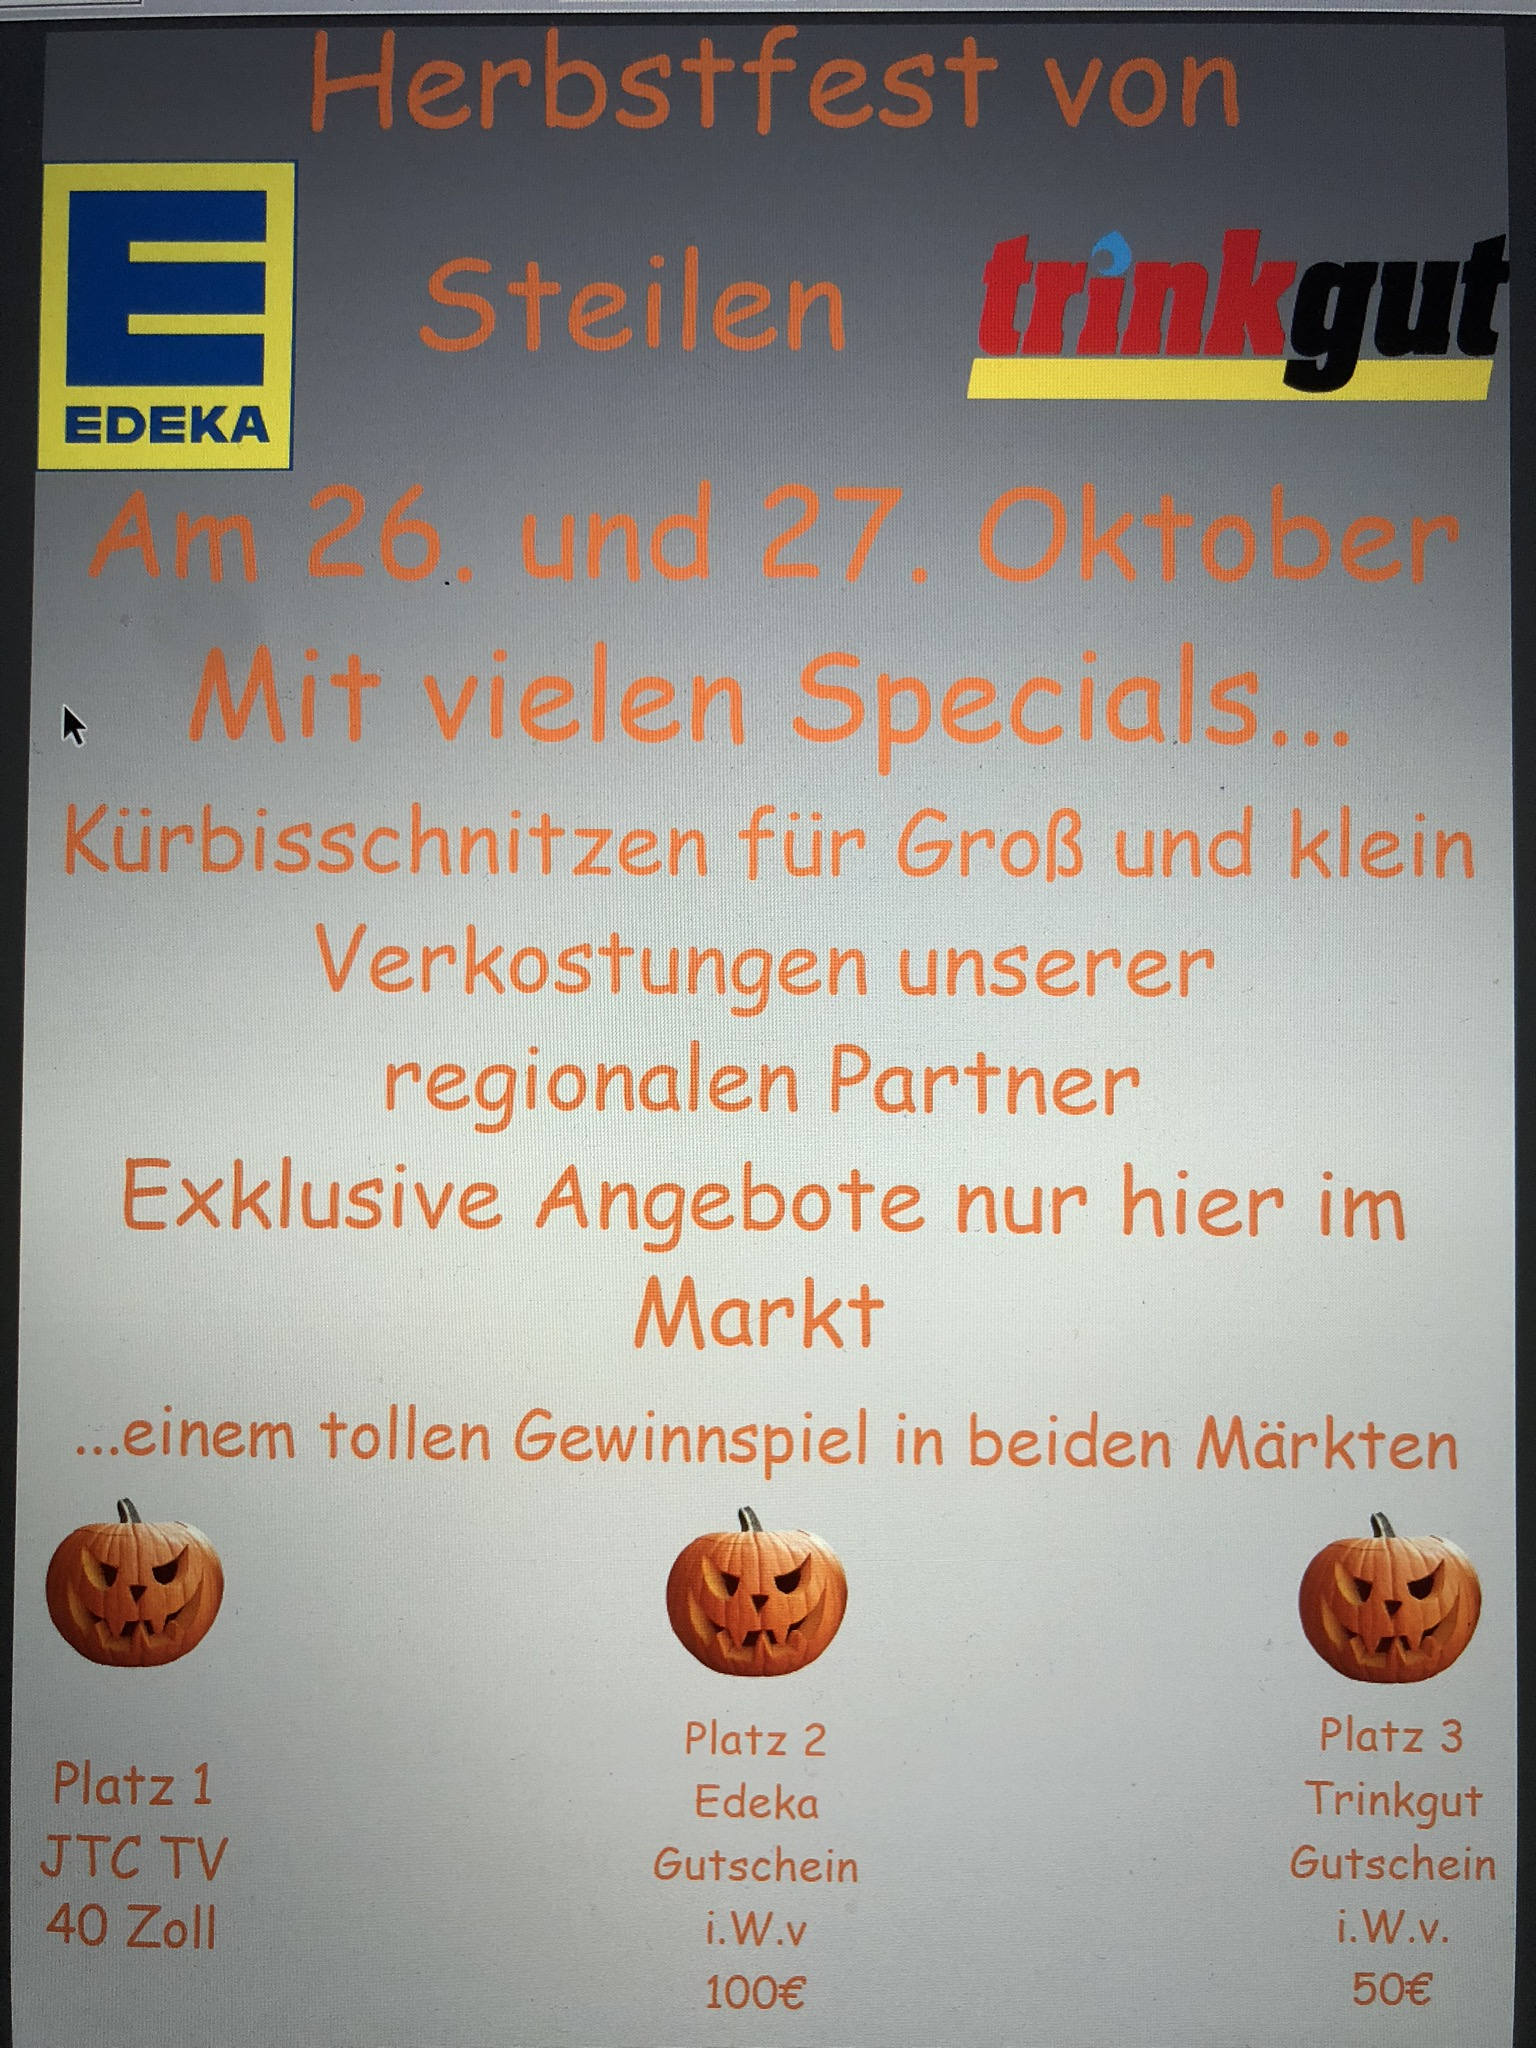 Herbstfest bei EDEKA & trinkgut Steilen